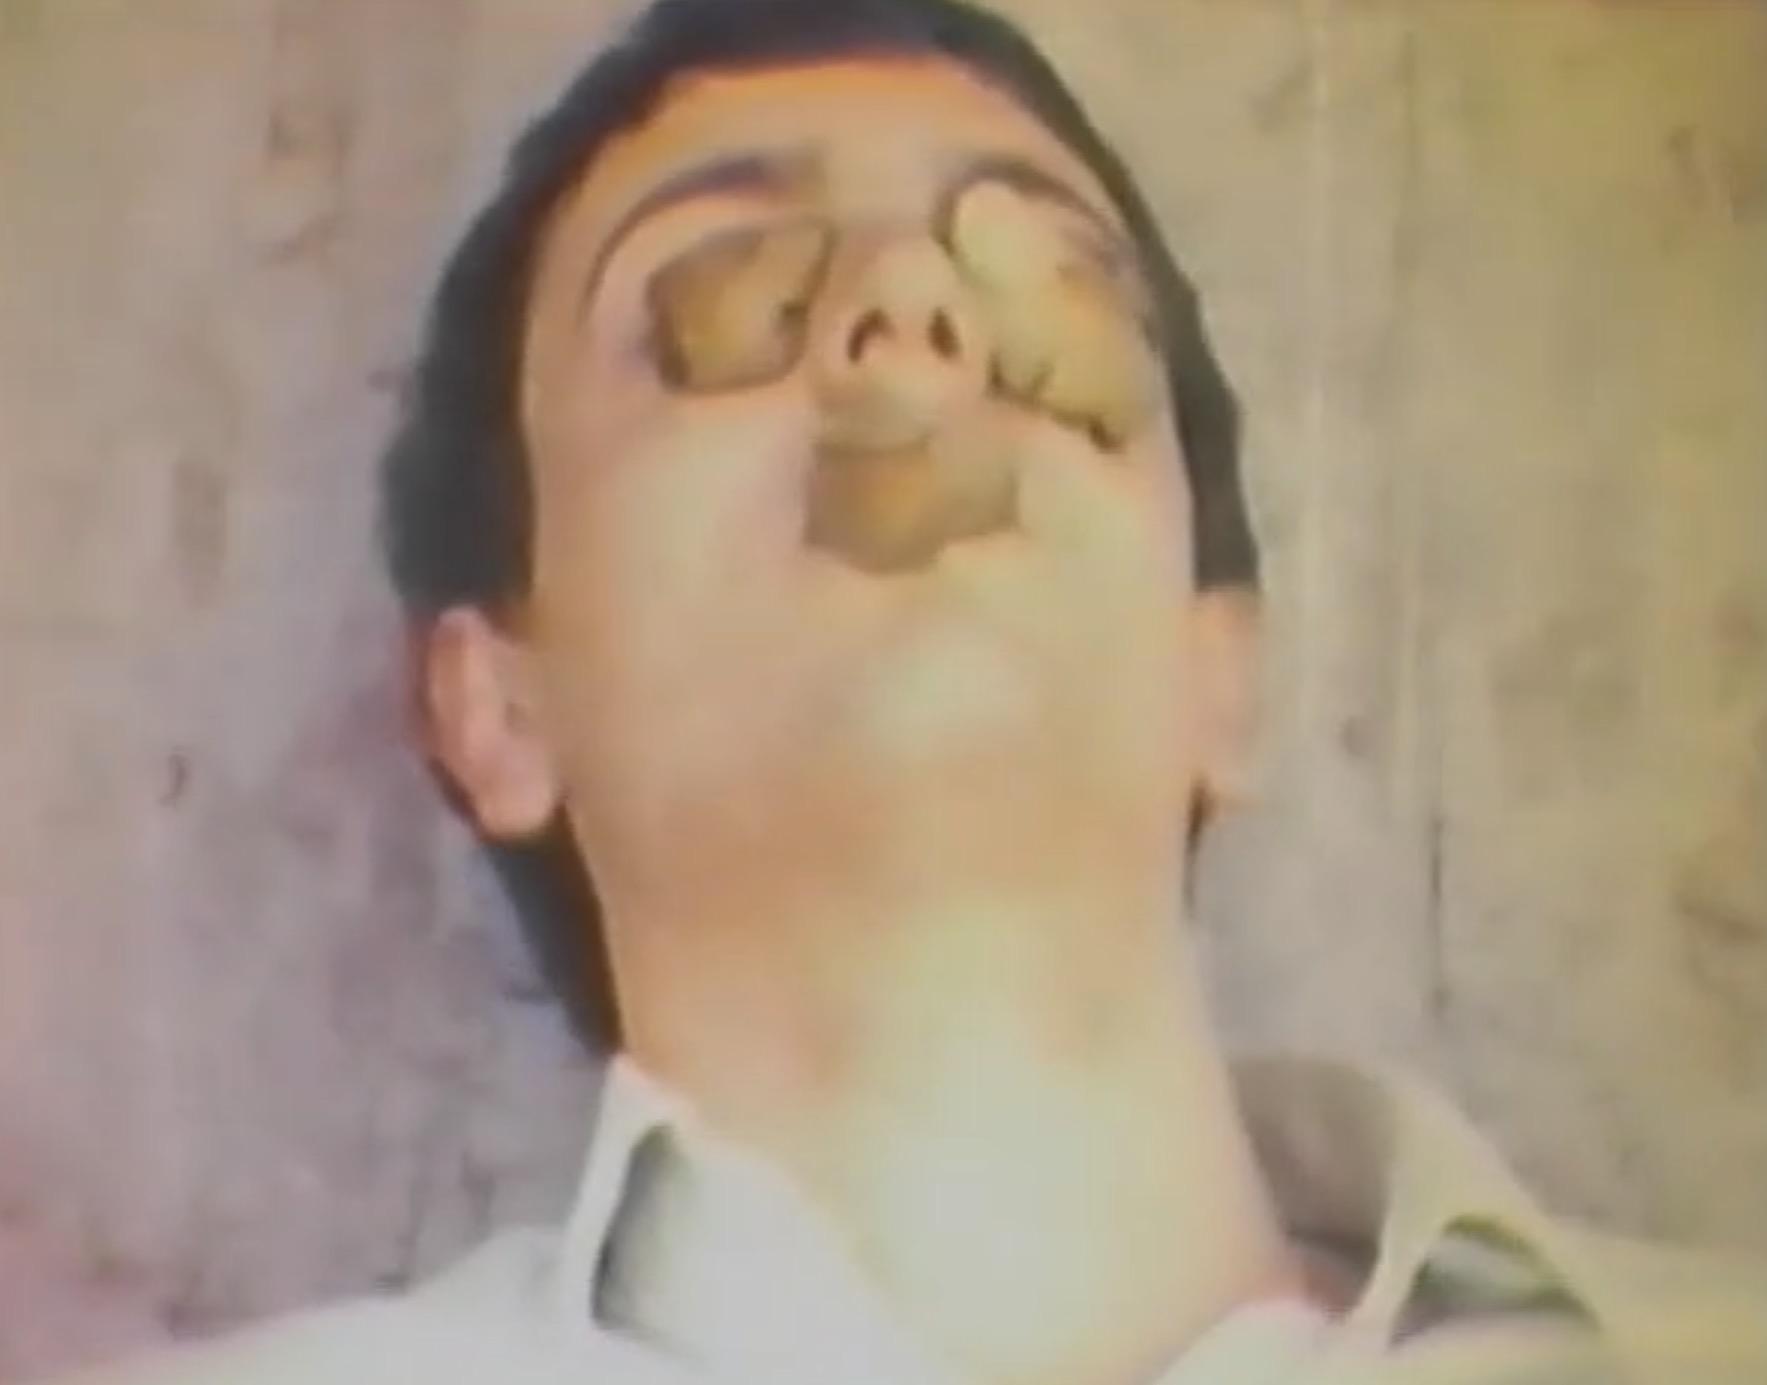 An 8mm film of Pink Floyd founding member Syd Barrett's first mushroom trip